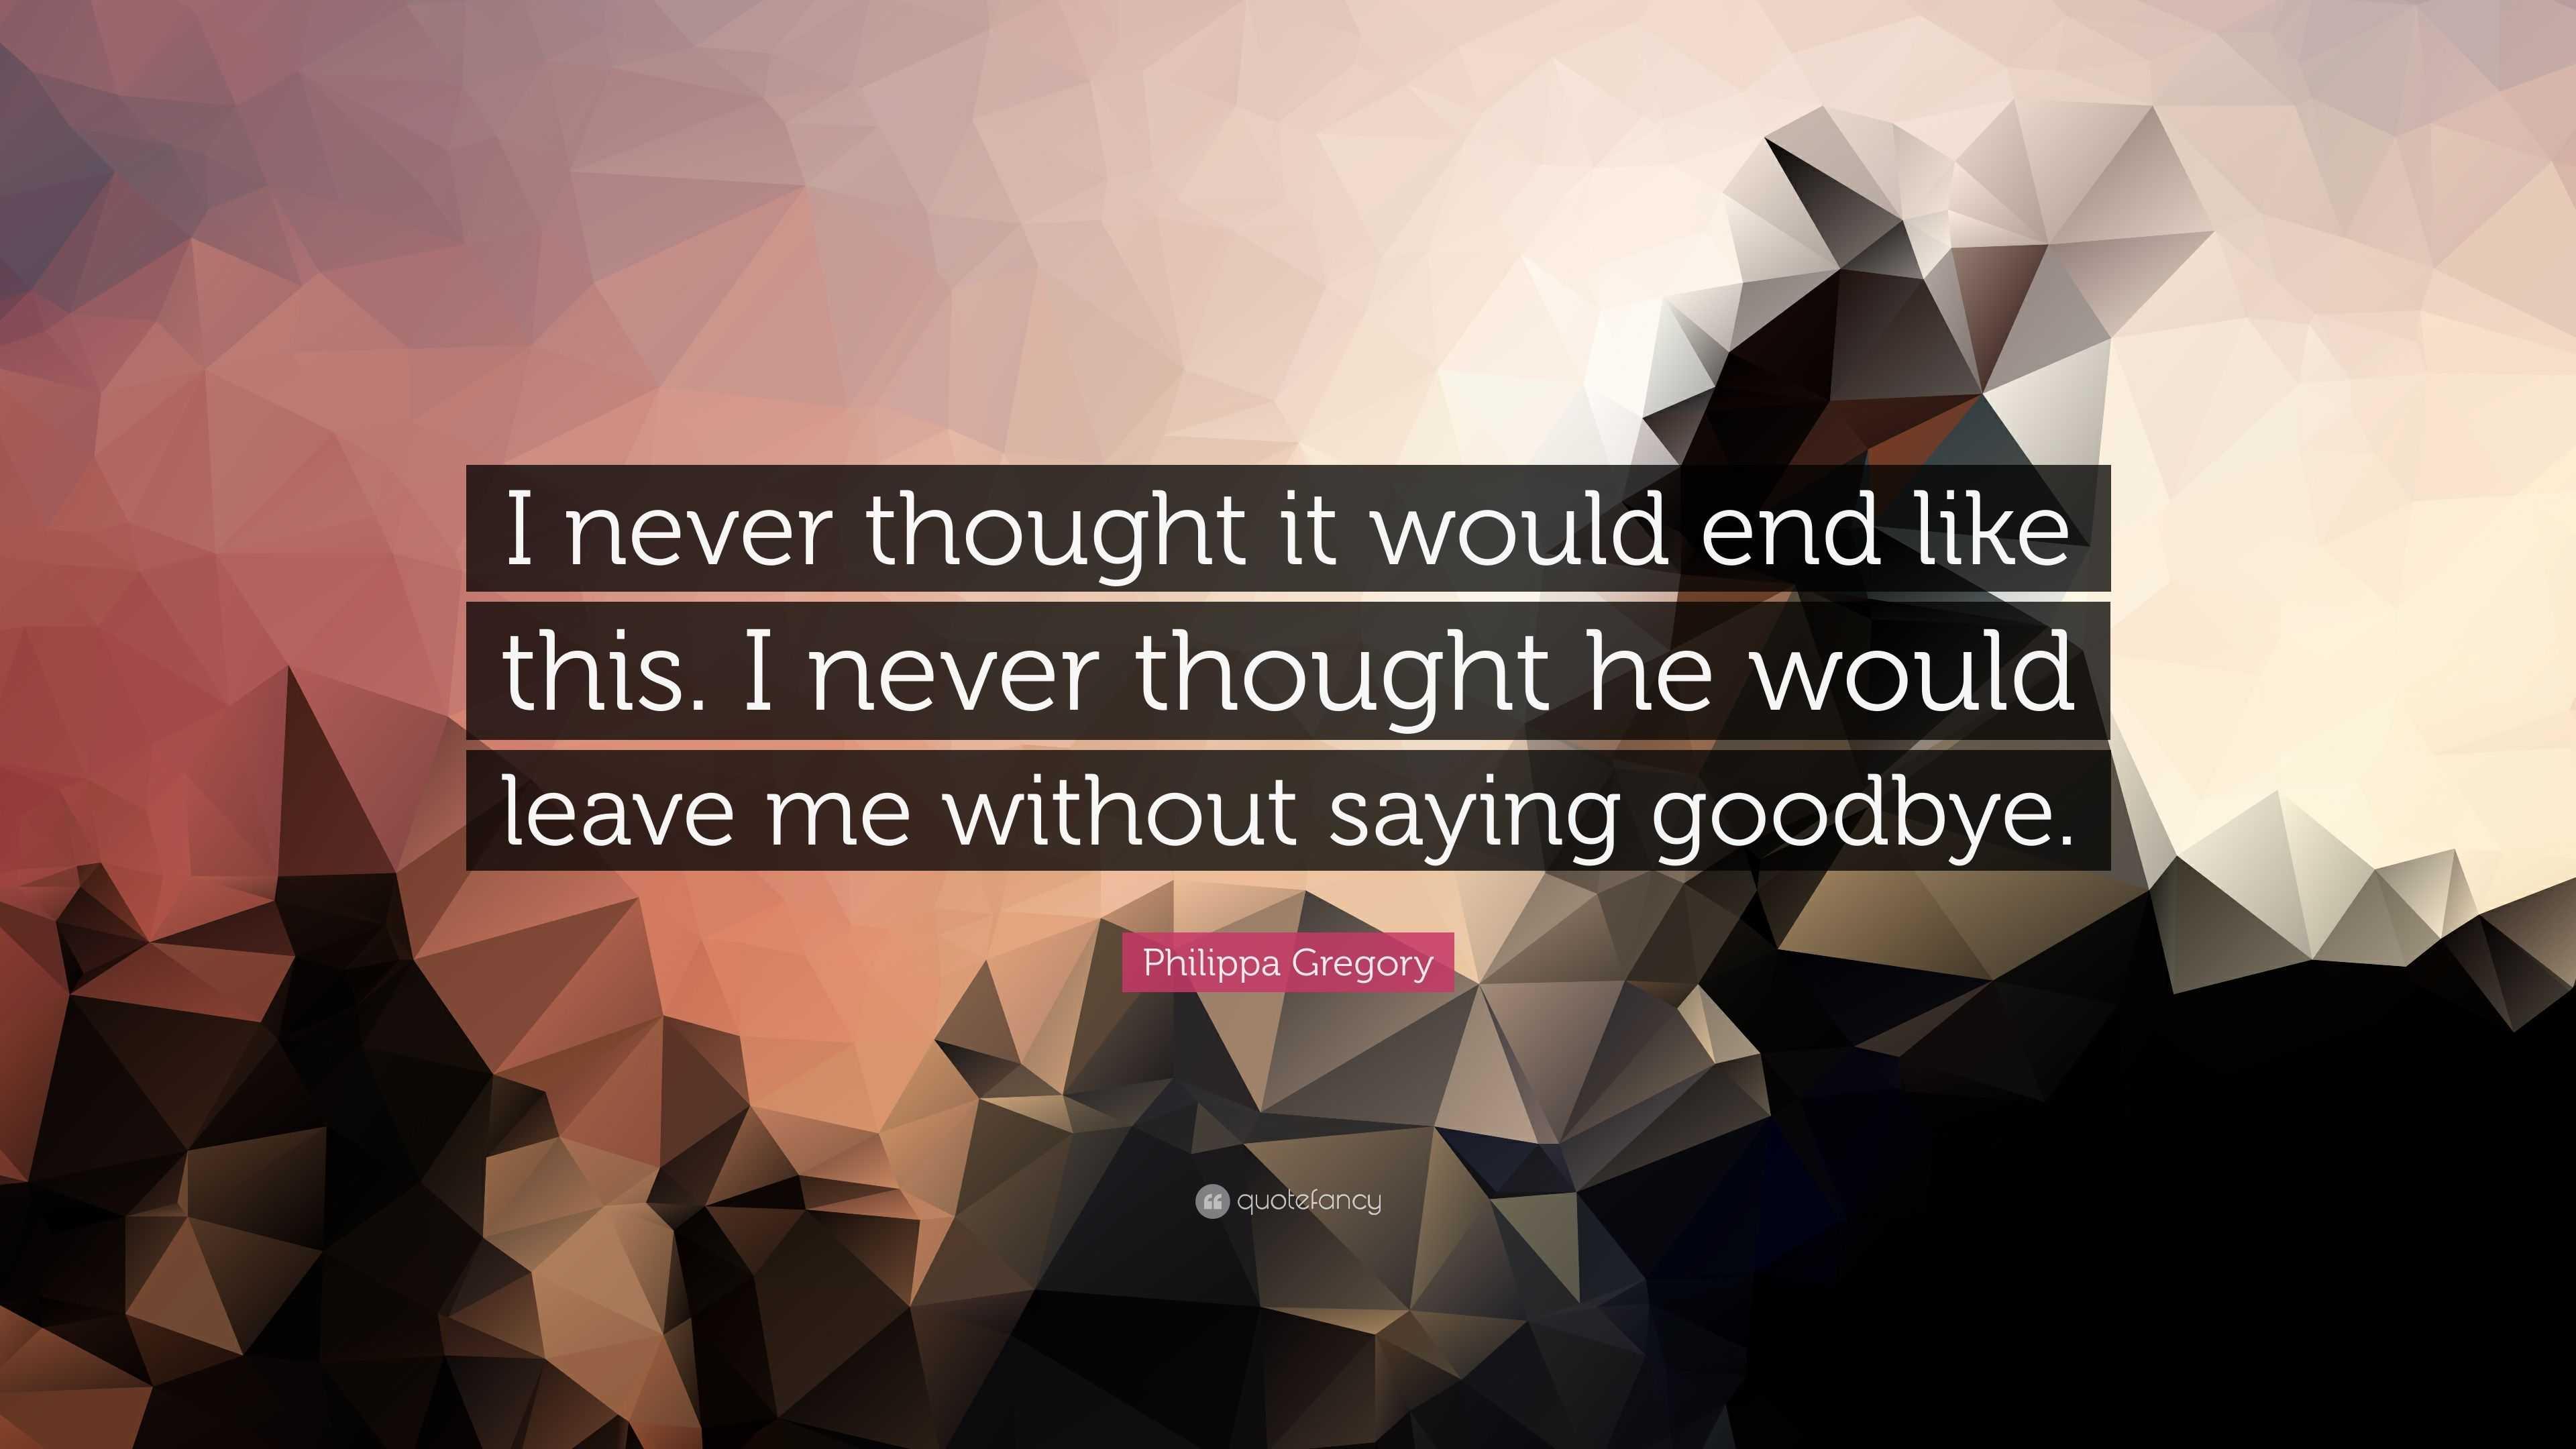 Goodbye left why he without saying One Big